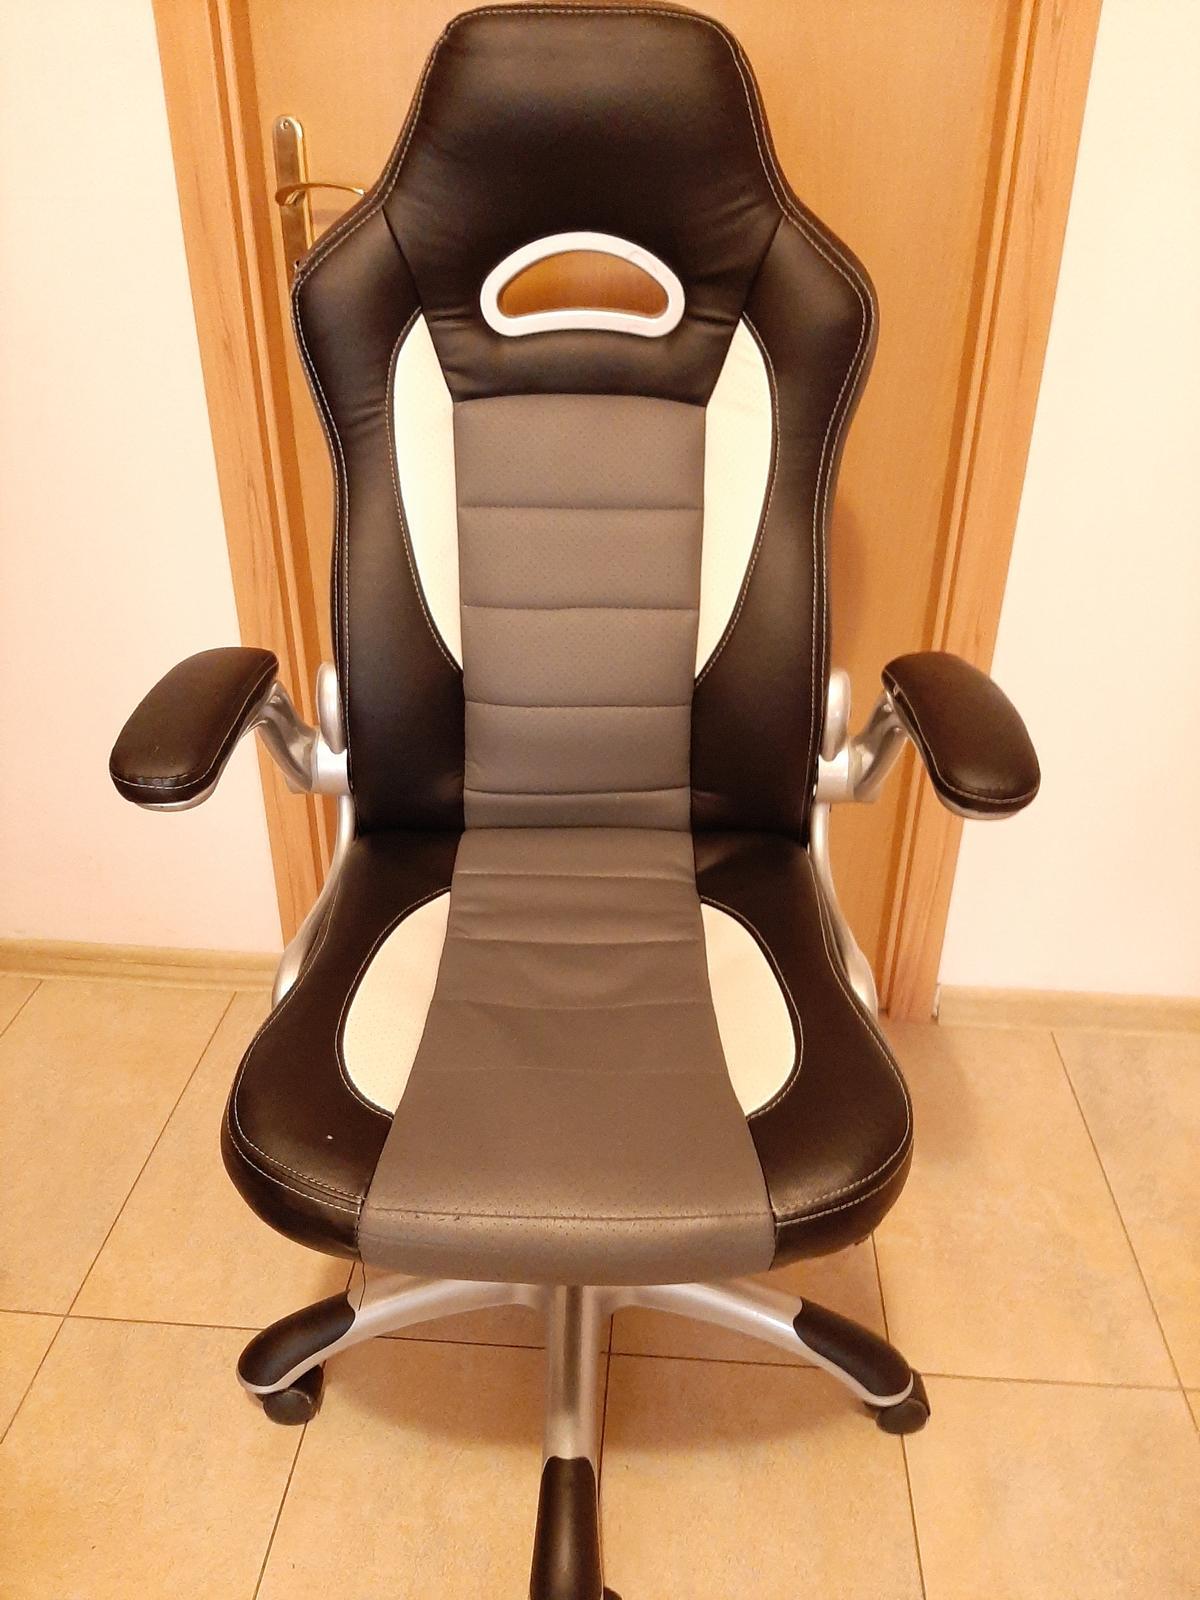 kancelárska masívna stolička - Obrázok č. 1